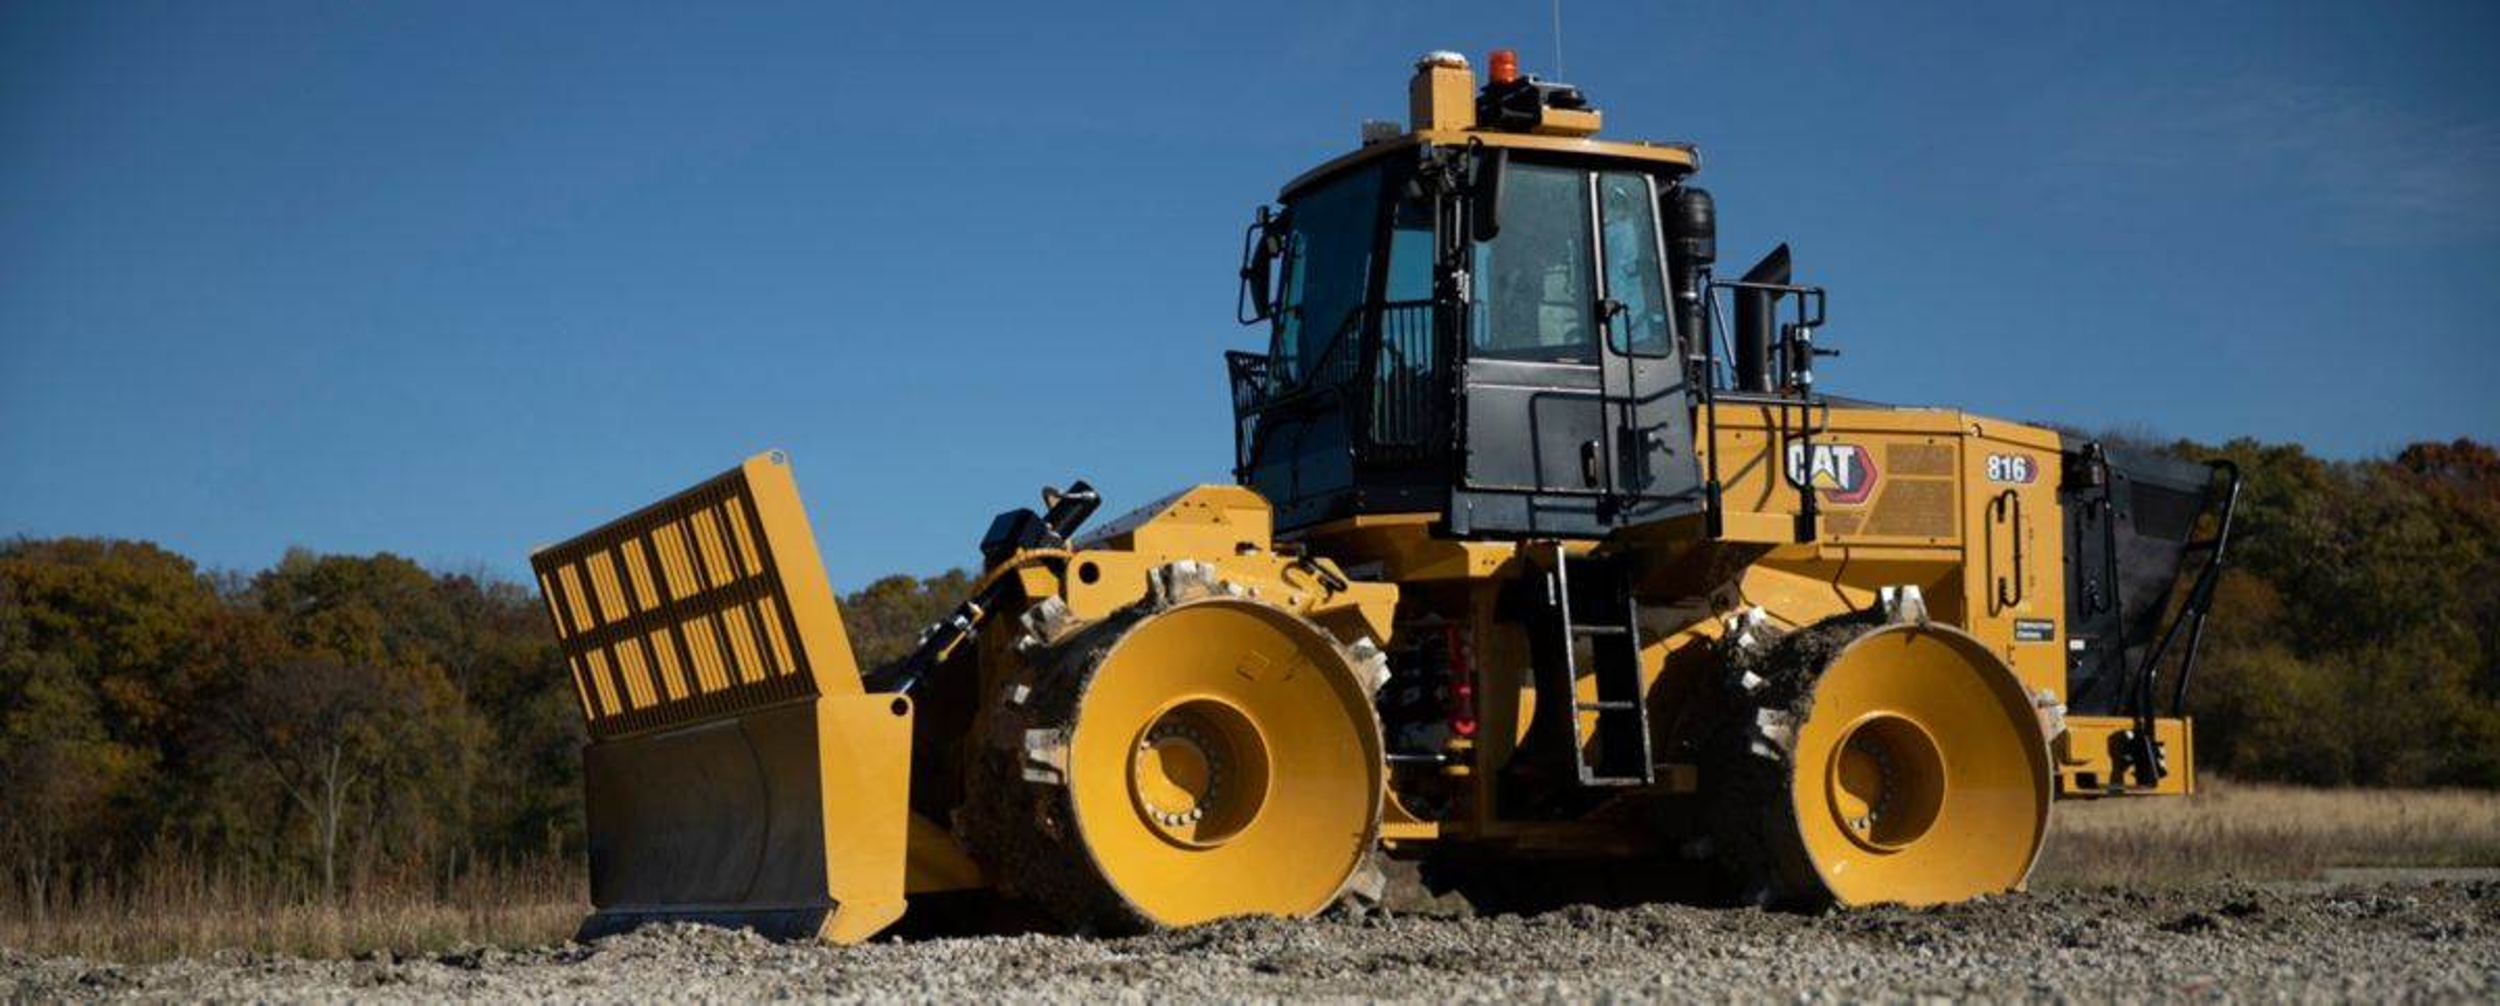 New Cat® 816 Landfill Compactor